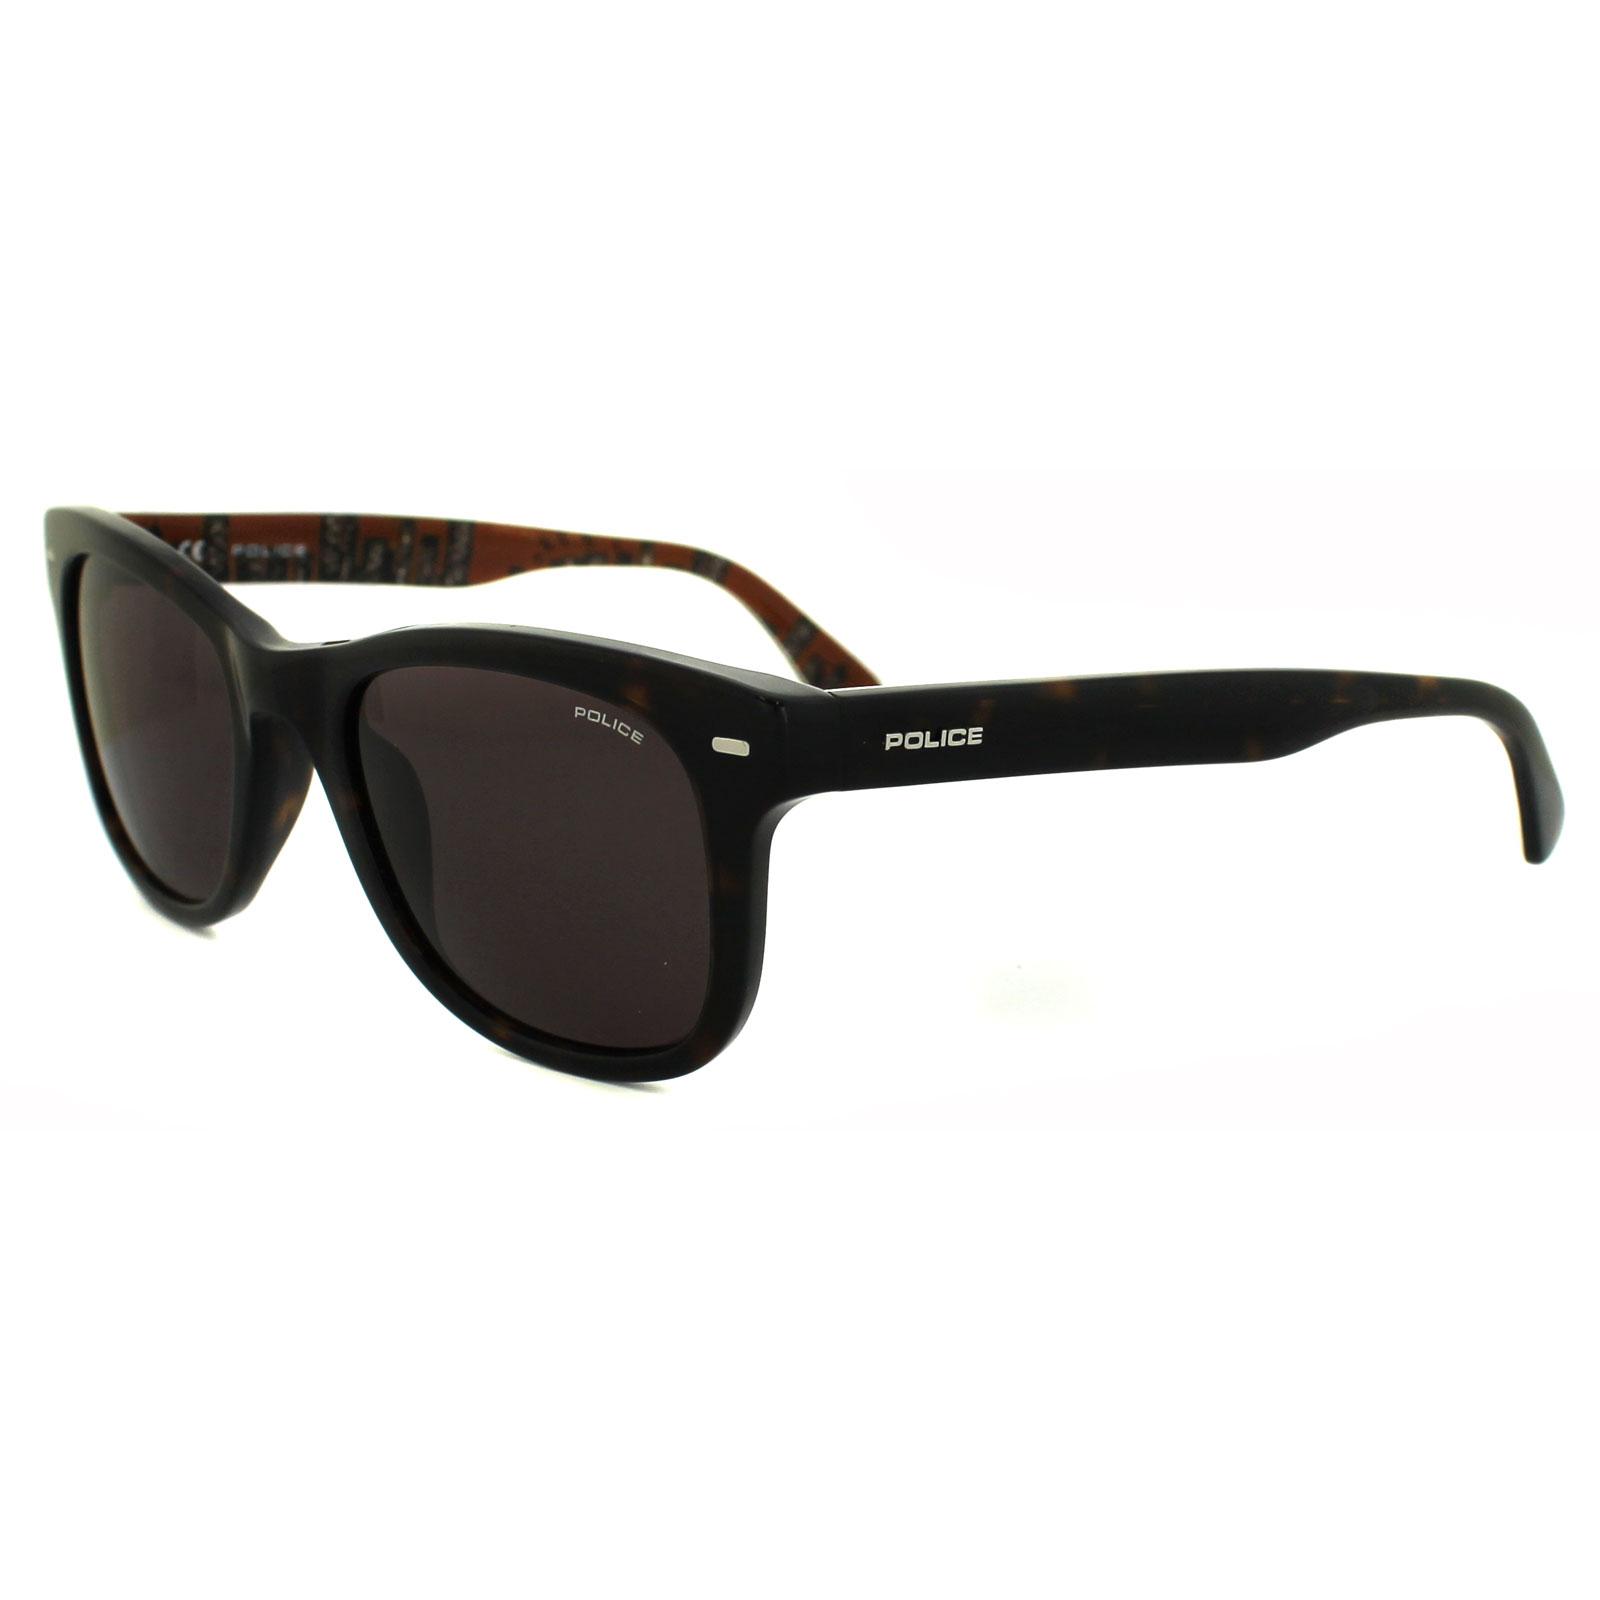 Cheap Police Sunglasses 1861 Skyline 2 Discounted Sunglasses